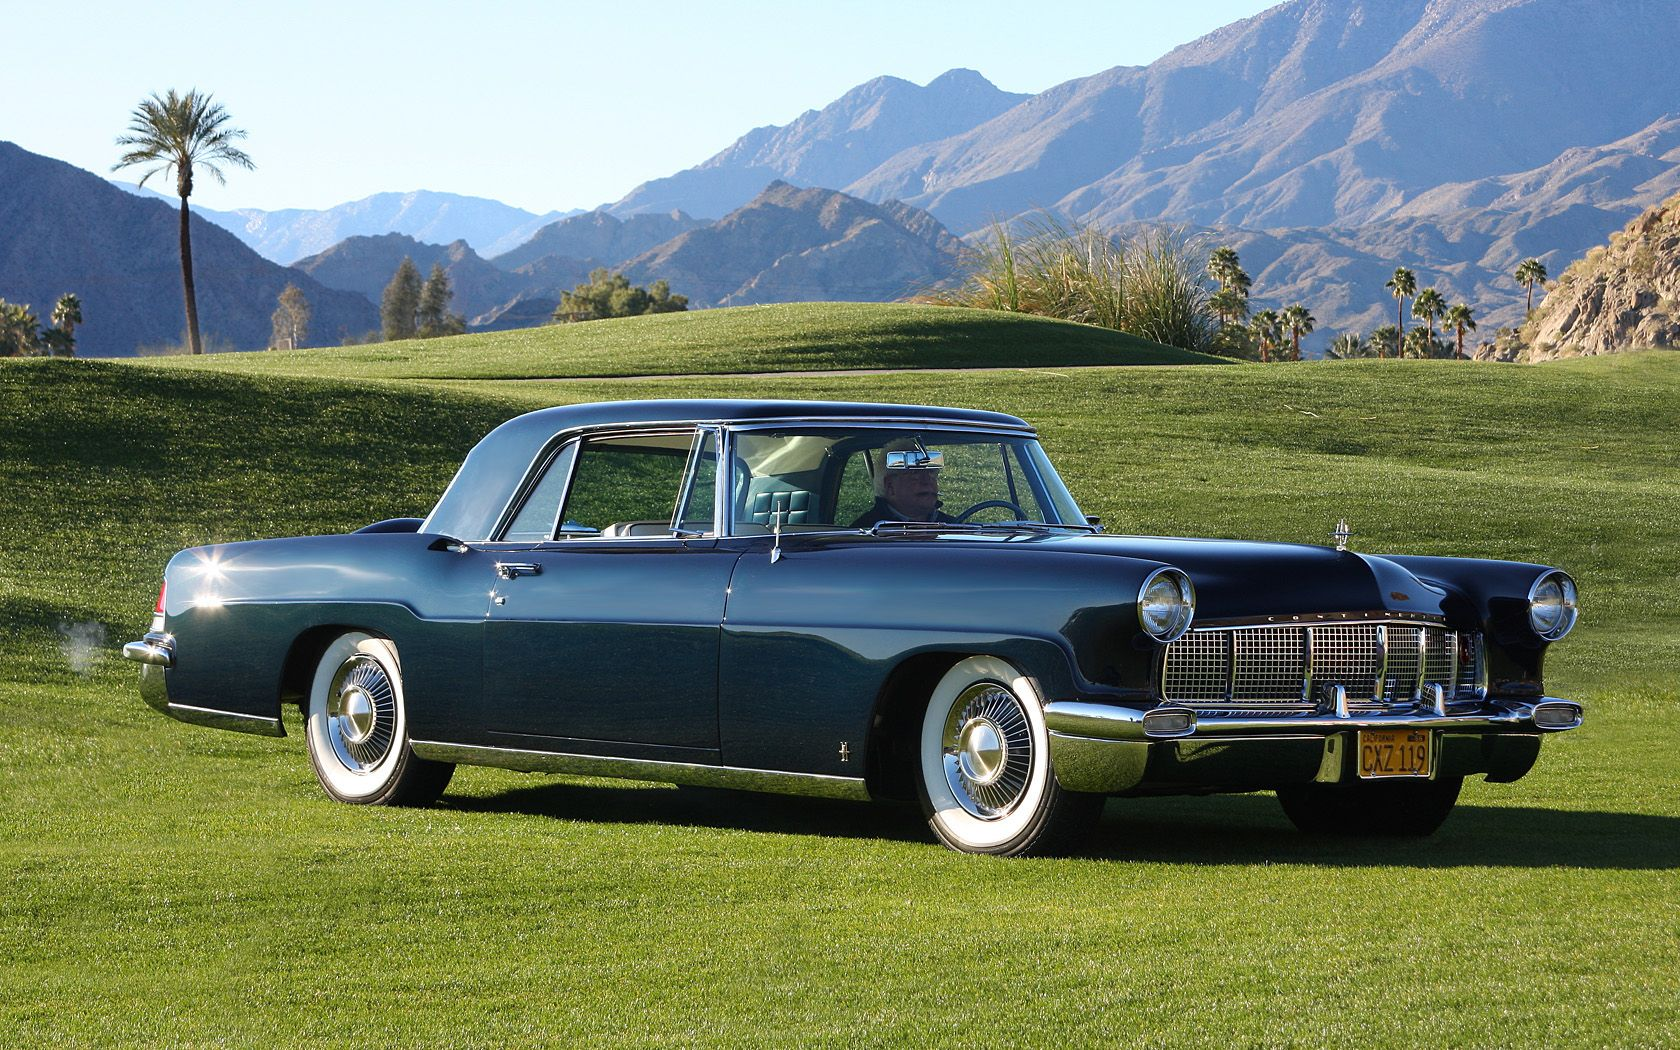 1956 continental mark ii auto lincoln pinterest. Black Bedroom Furniture Sets. Home Design Ideas